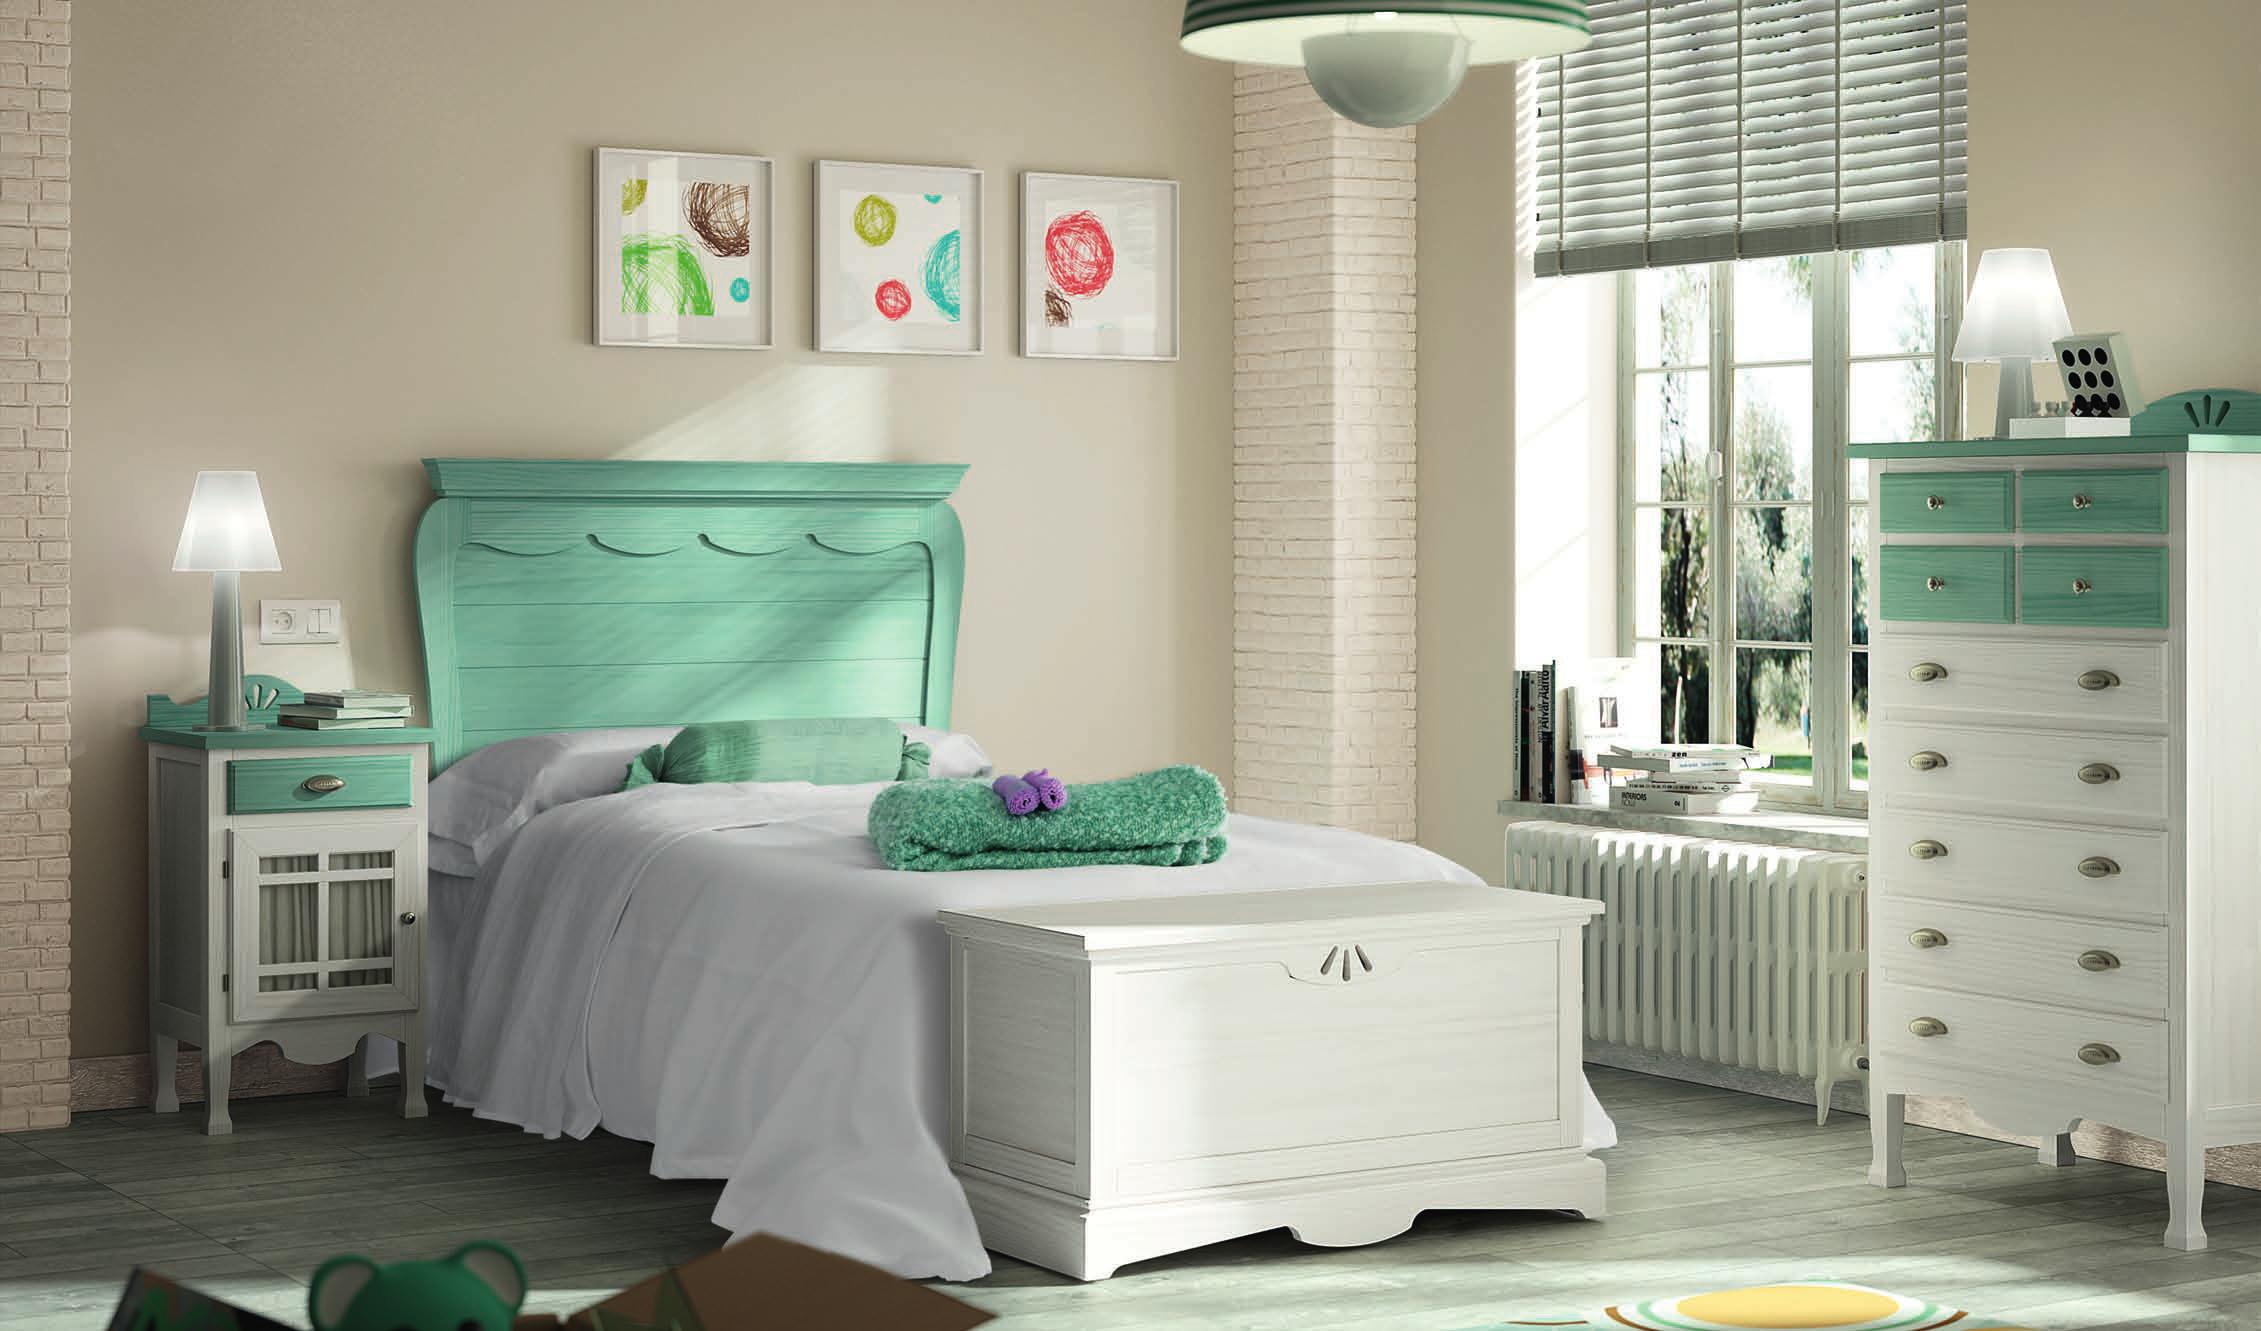 416-dormitorio-j-29